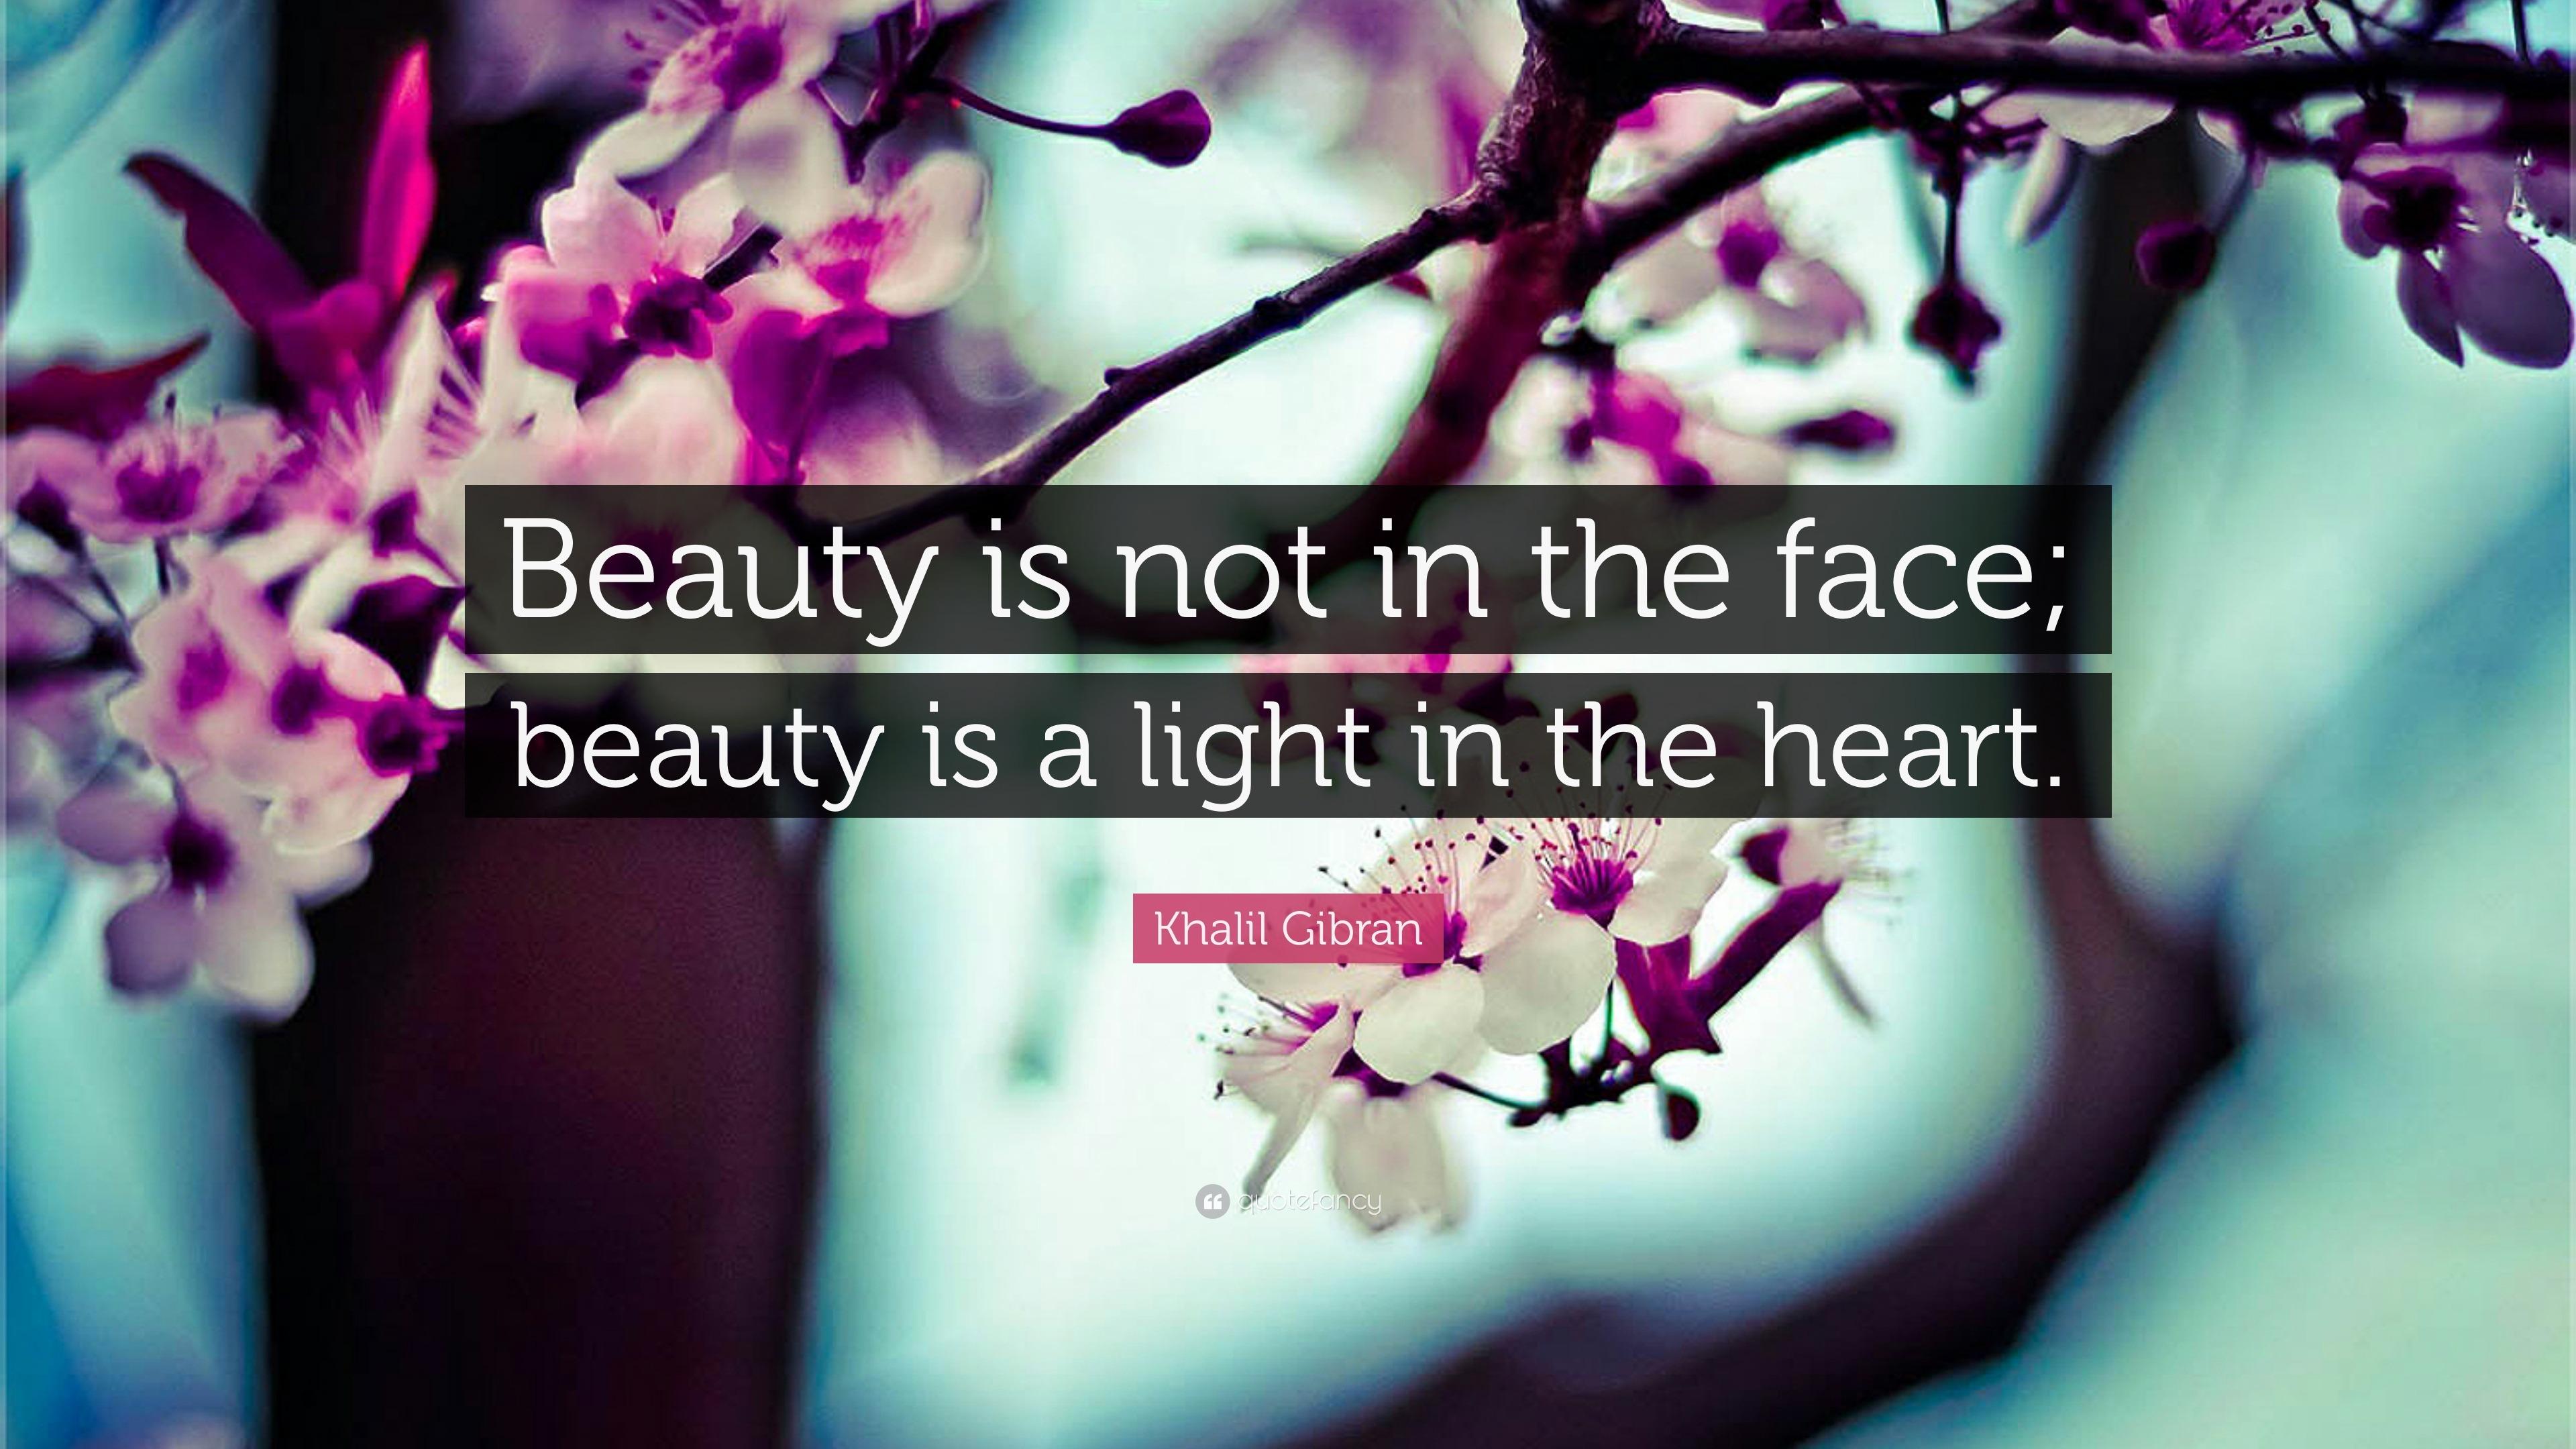 Khalil Gibran Quote Desktop Wallpaper Khalil Gibran Quote Beauty Is Not In The Face Beauty Is